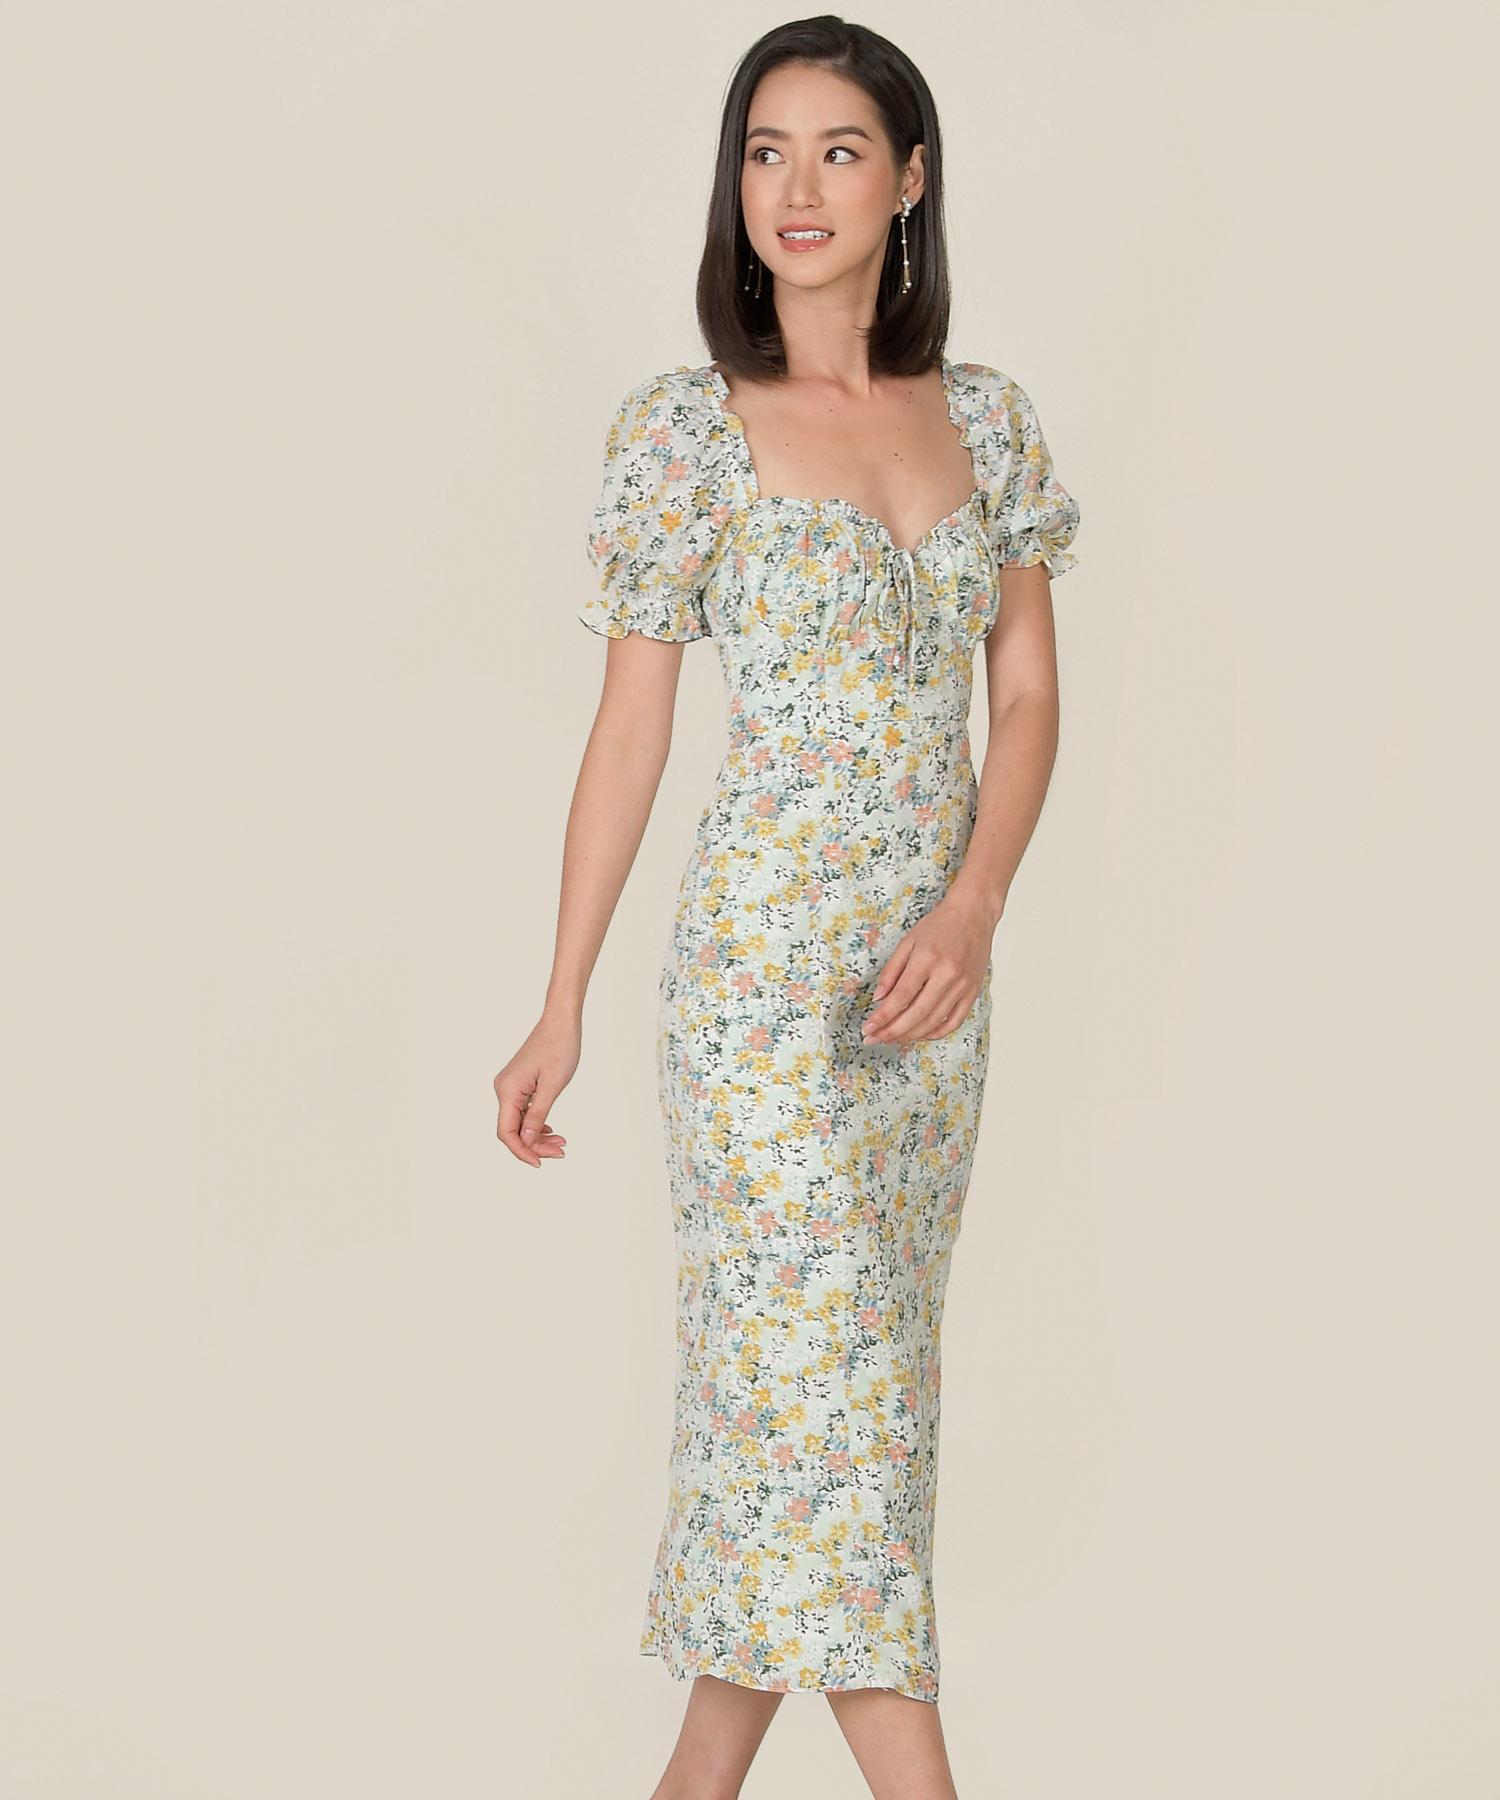 winslet-floral-gathered-midi-dress-pale-seafoam-1